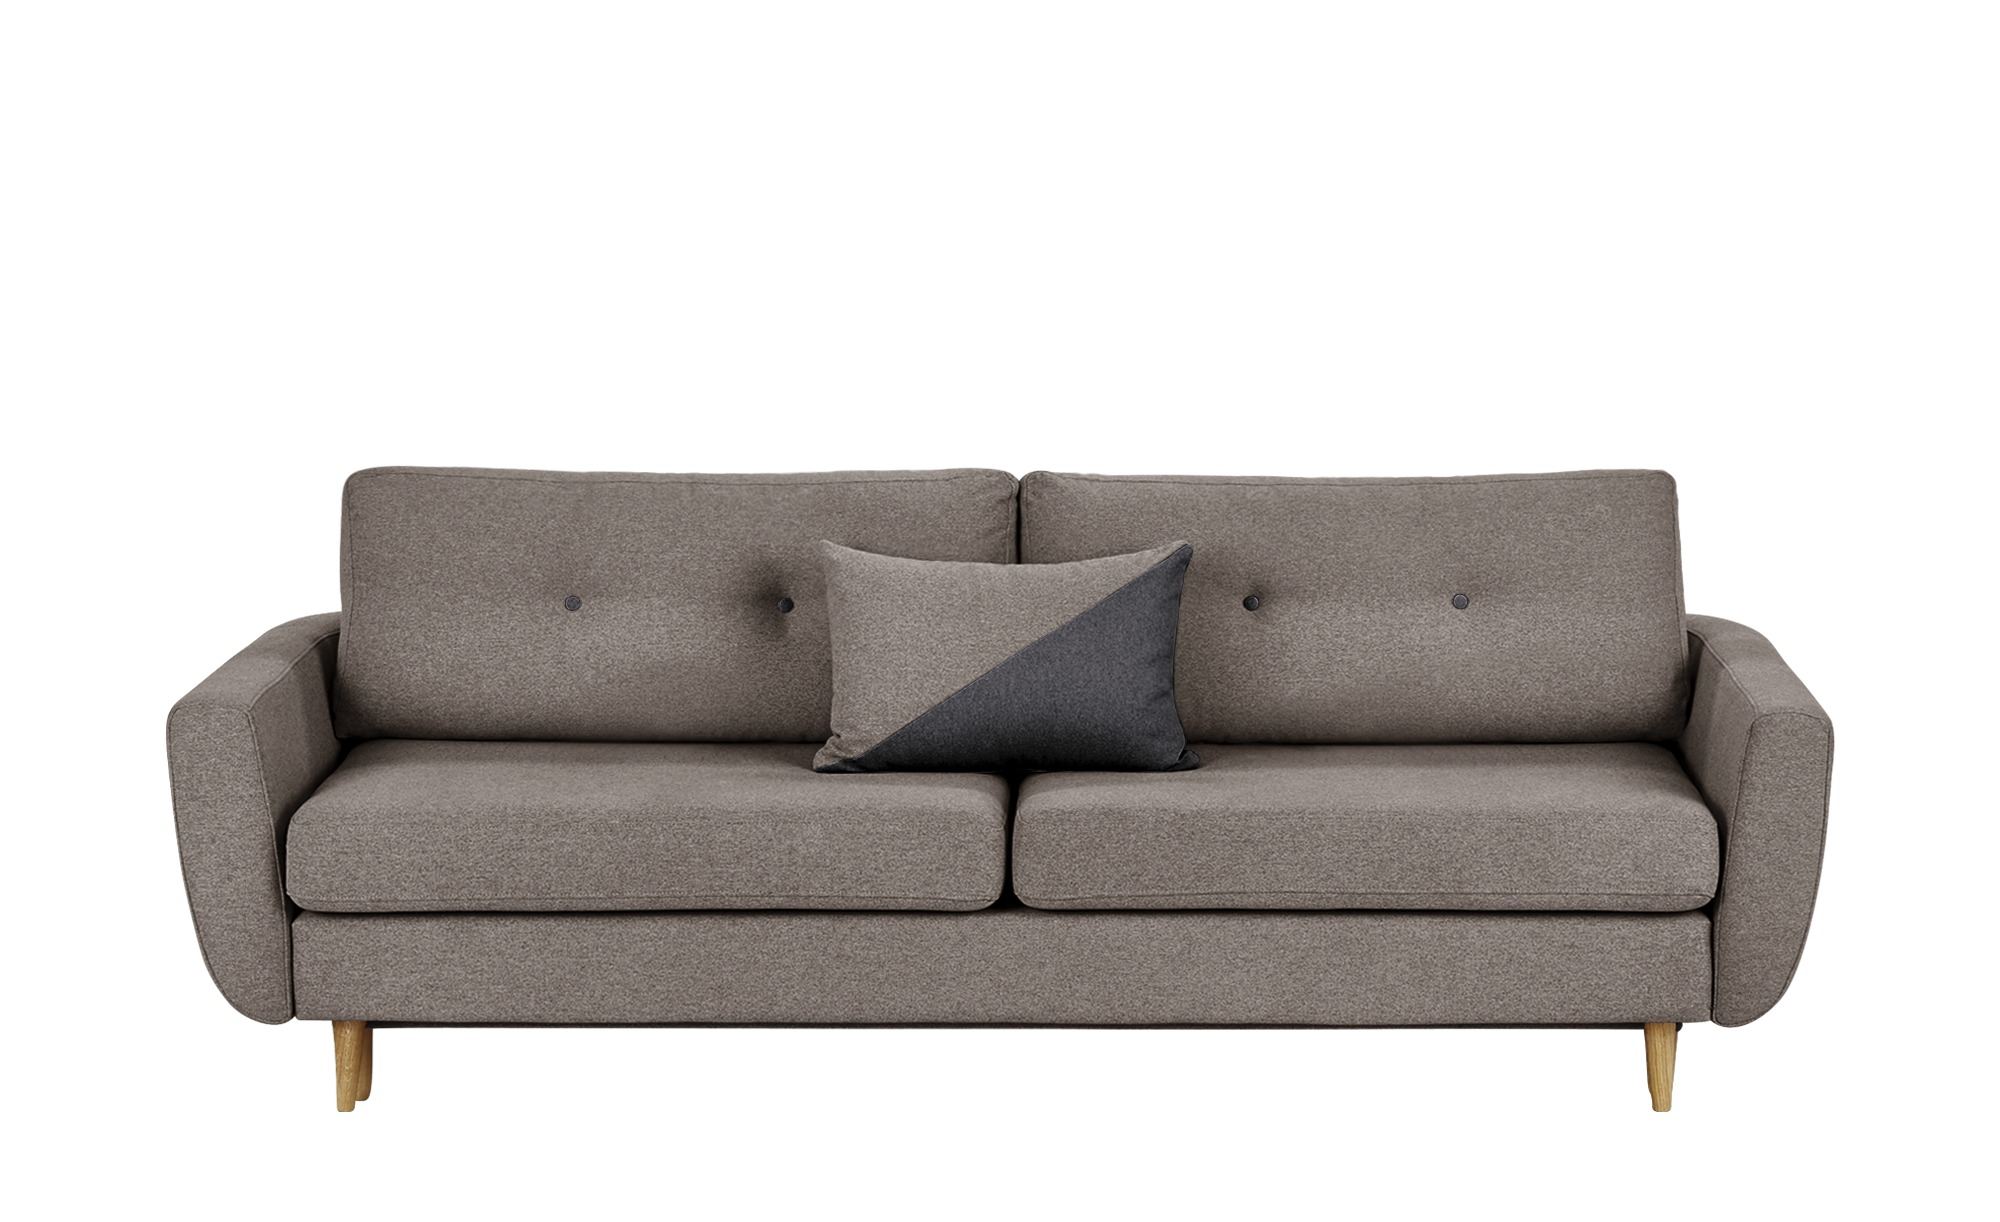 finya Schlafsofa, 3-sitzig grau - Webstoff Harris ¦ Maße (cm): B: 231 H: 85 T: 92 Polstermöbel > Sofas > 3-Sitzer - Höffner